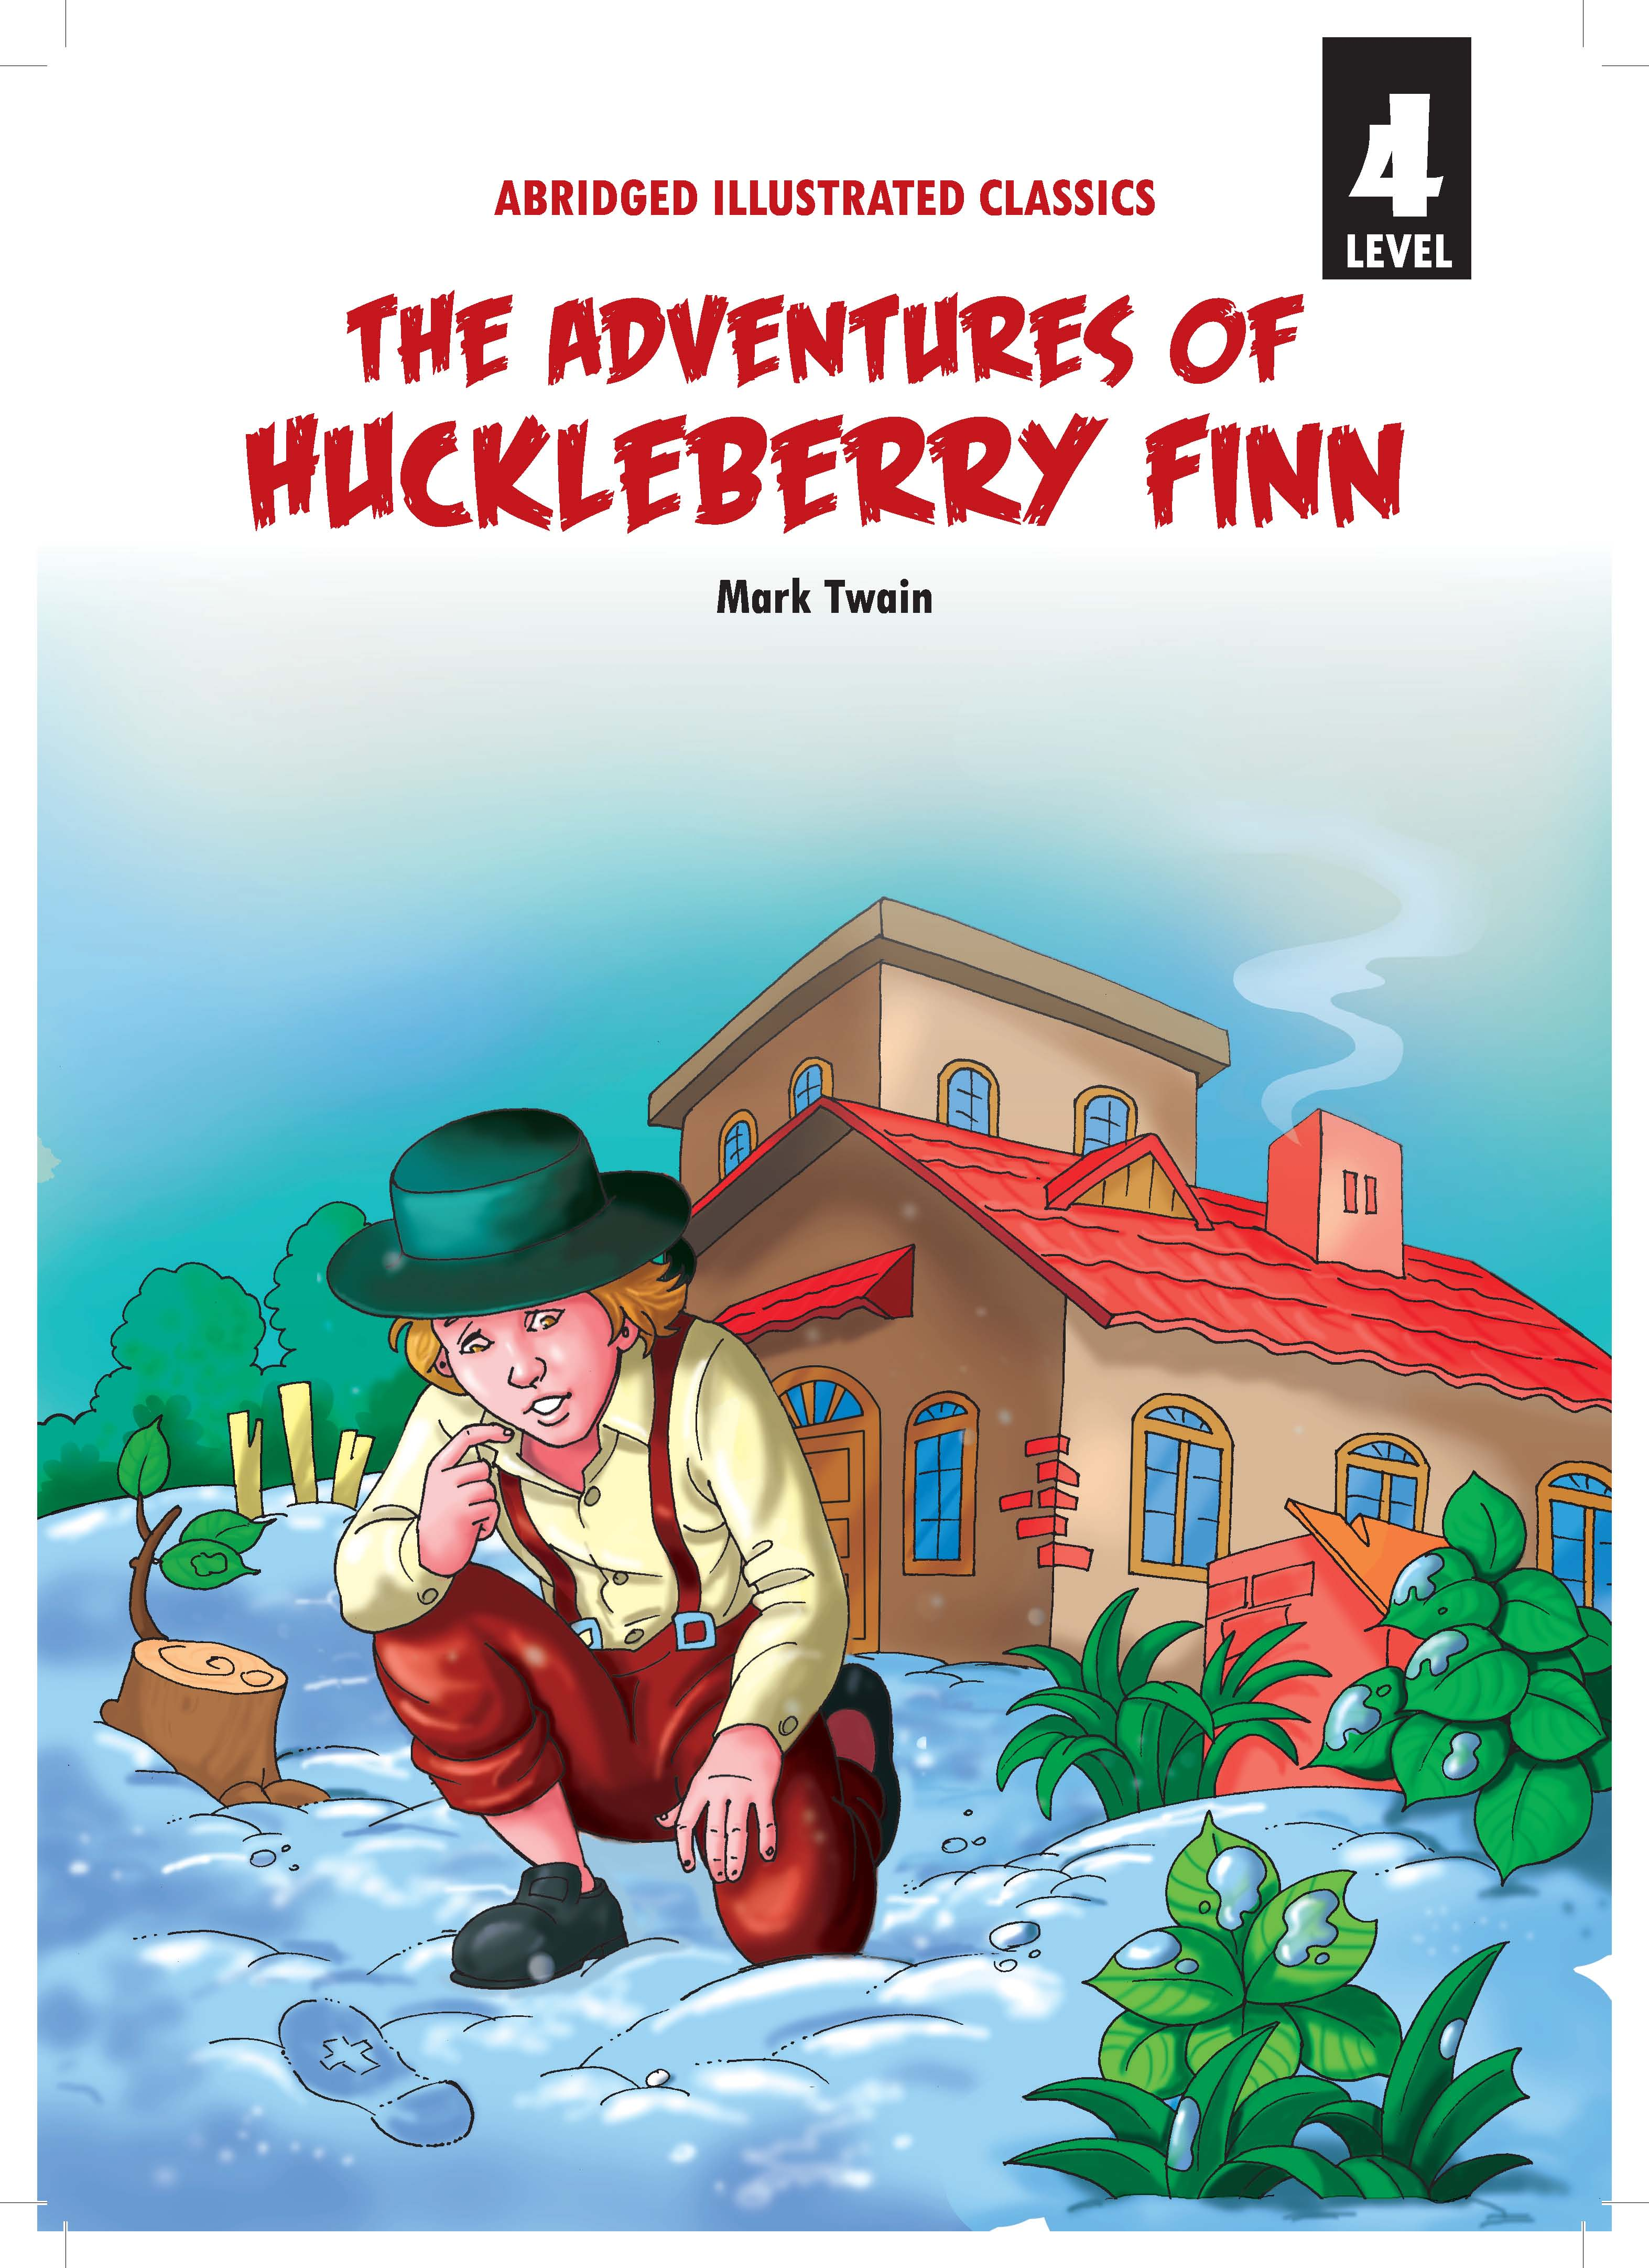 The Adventures of Huckleberry Finn Level 4 for Class 8